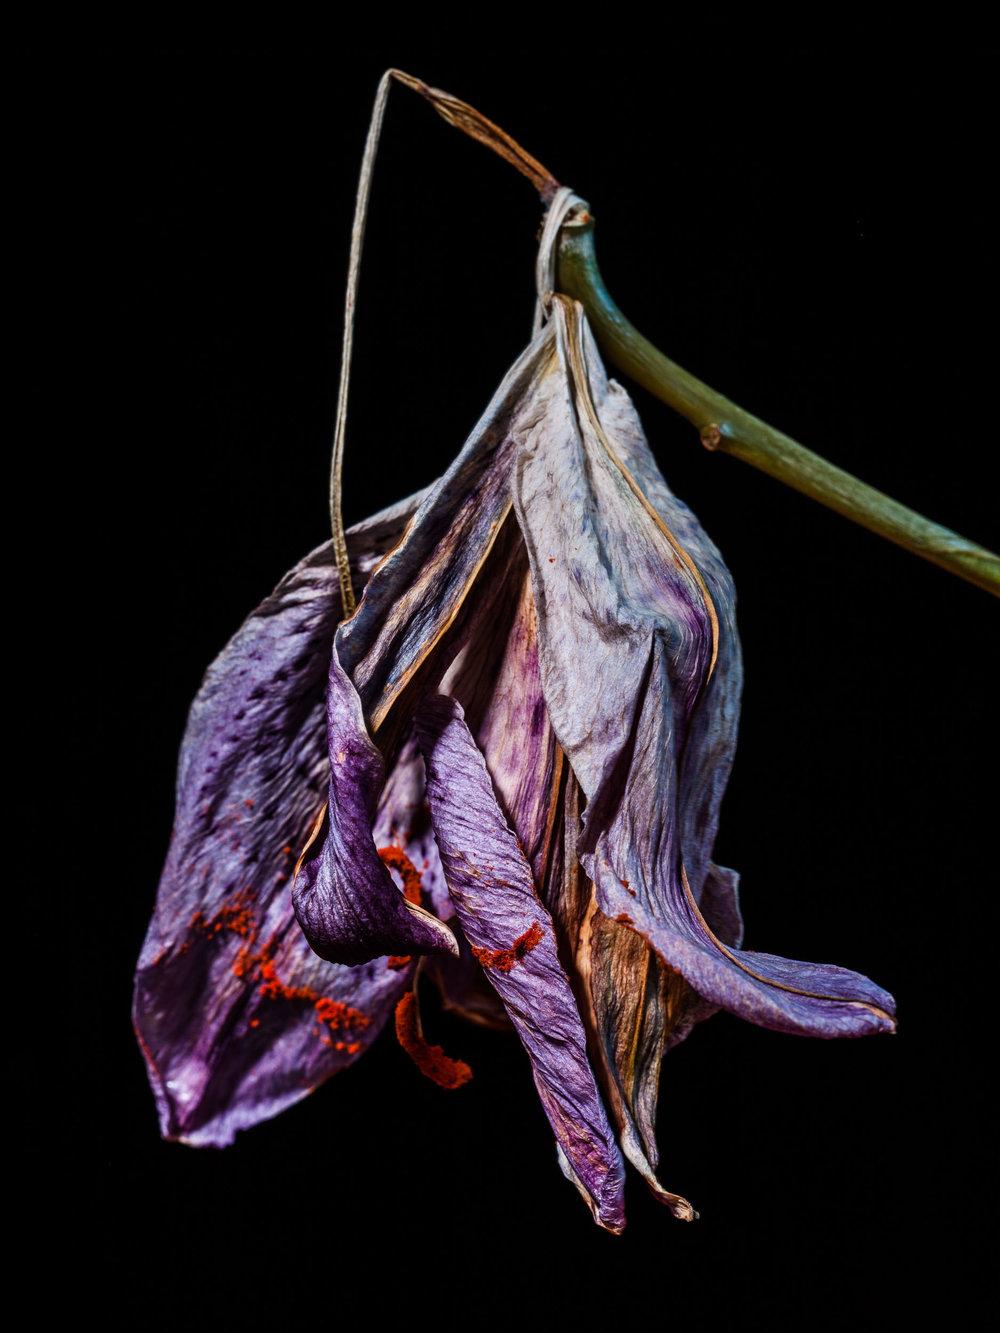 www.iaincrockart.com_flora-006999.jpg